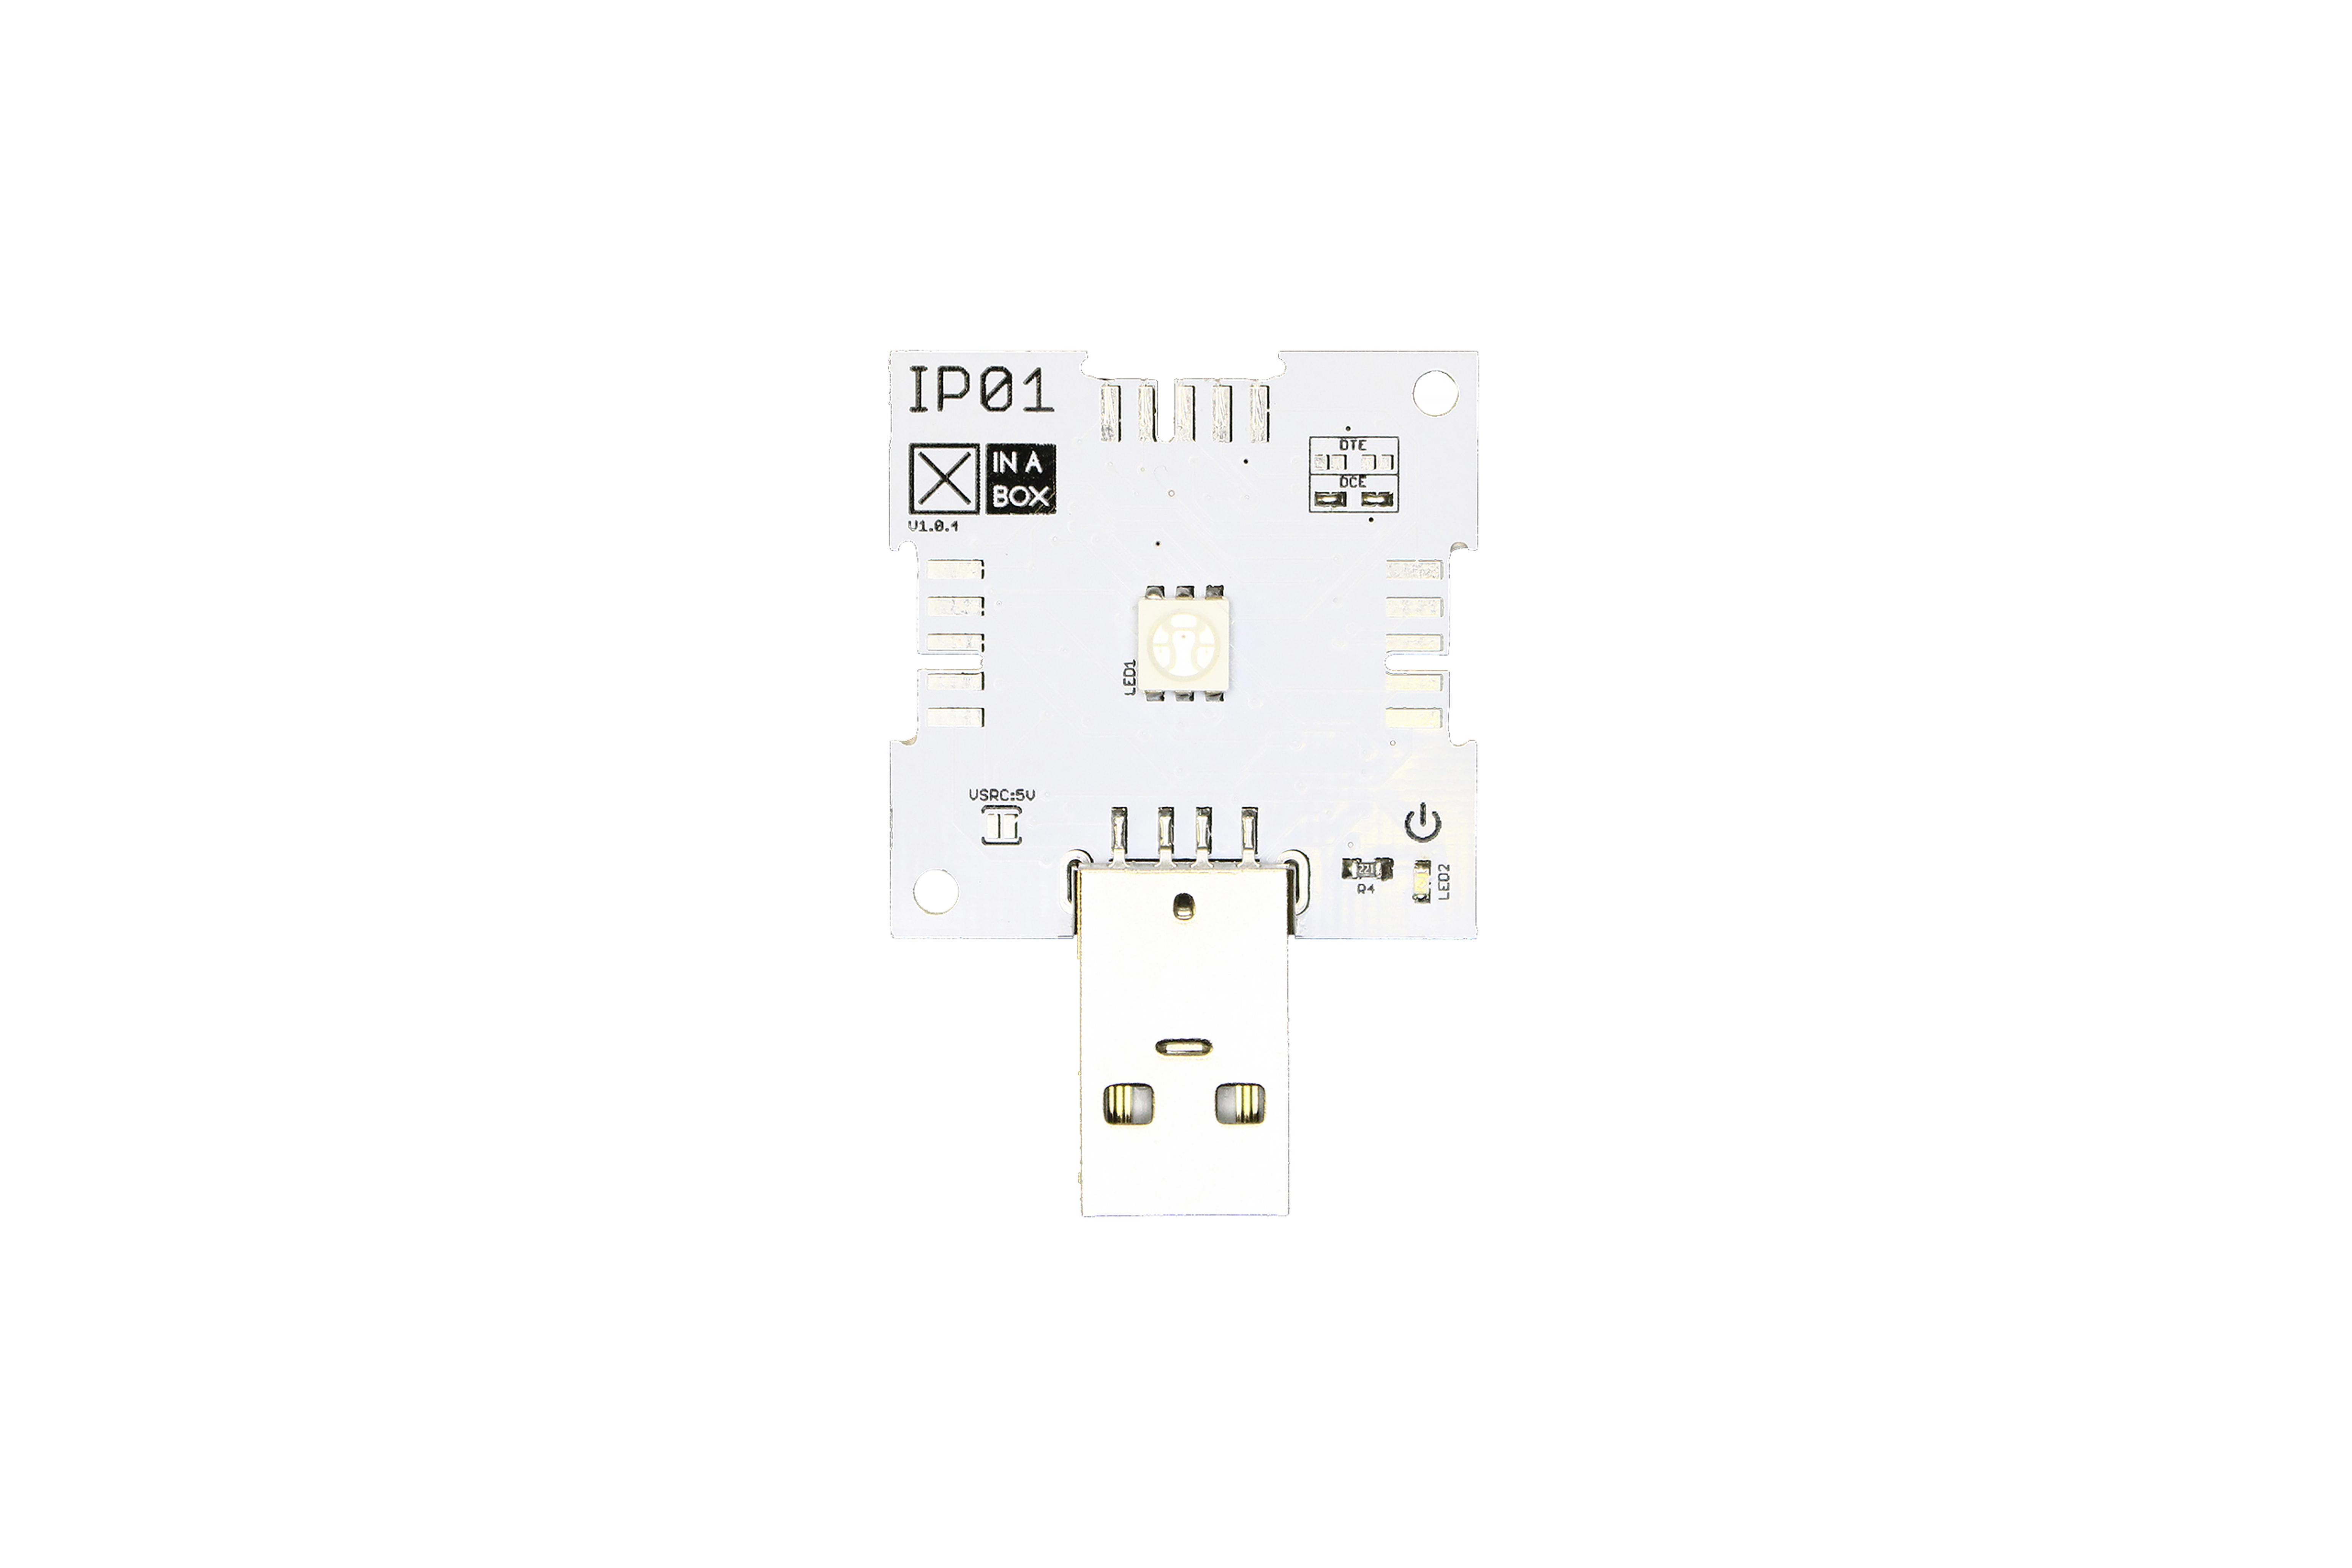 Xinabox Ip01 - USB Programming Interface (Ft232R)